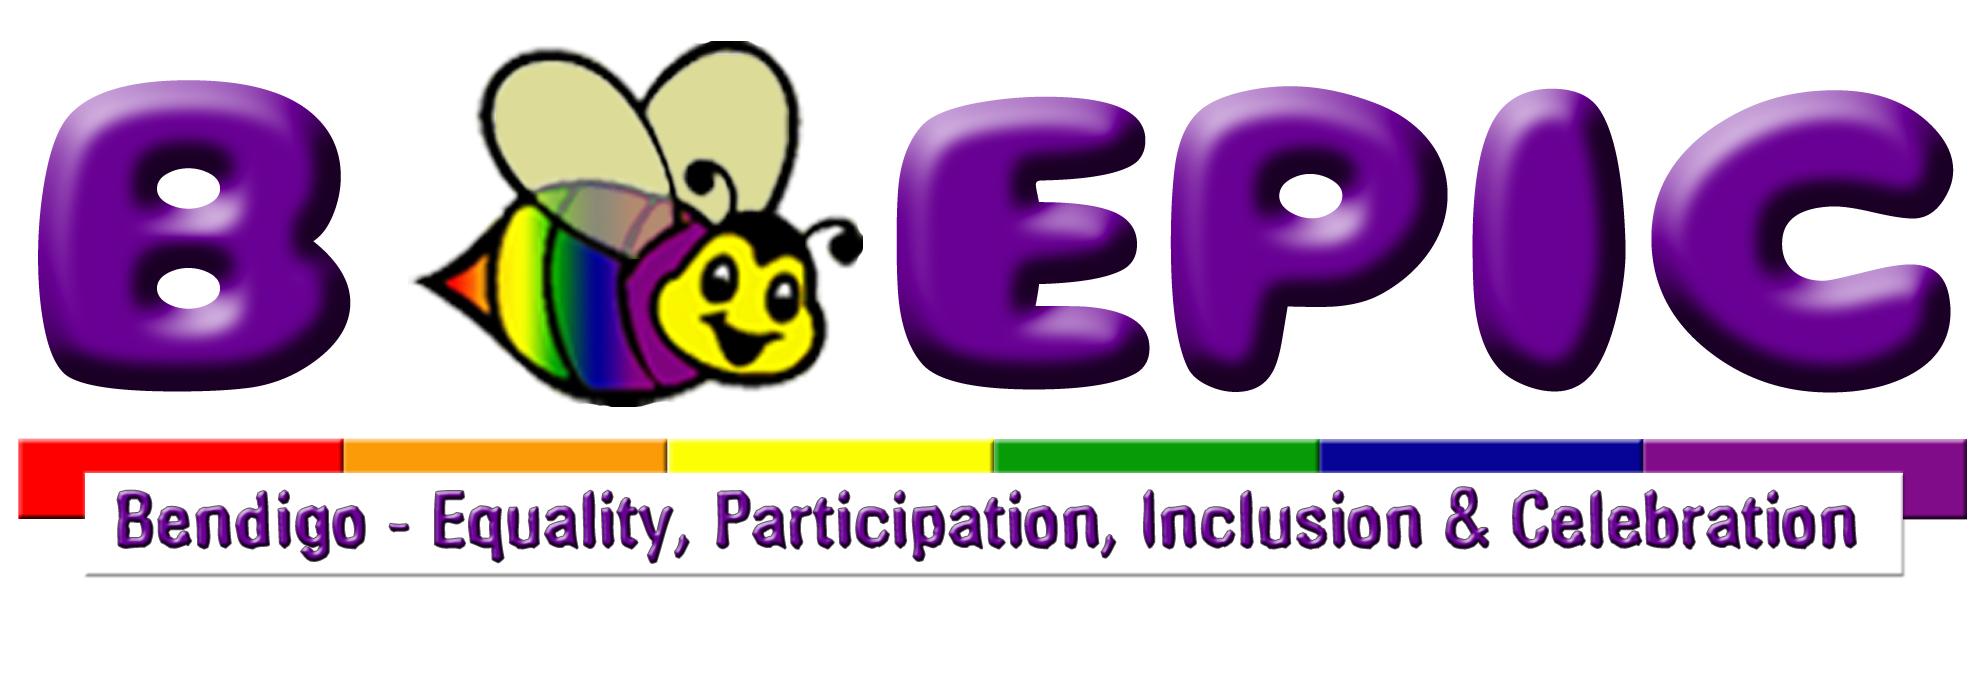 B-EPIC logo